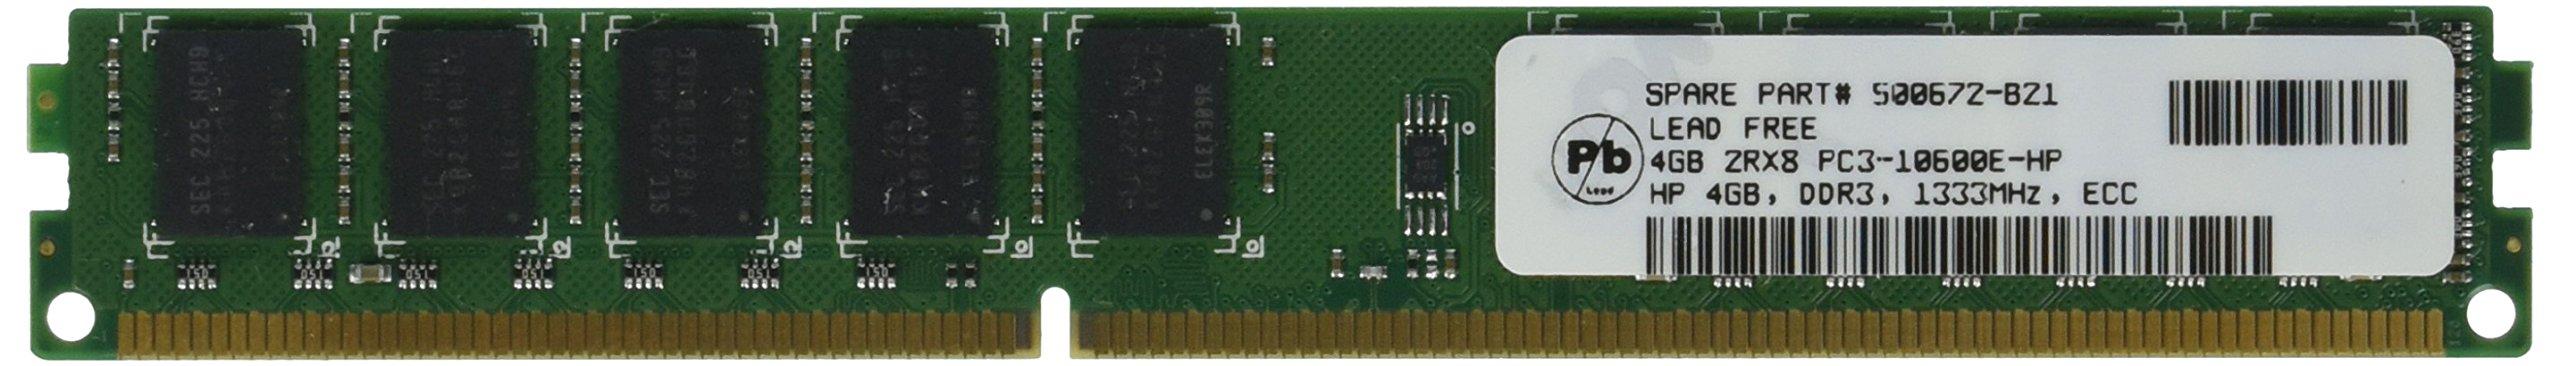 HP 500672-B21 4GB DDR3 SDRAM Memory Module - CM8680 by HP (Image #1)